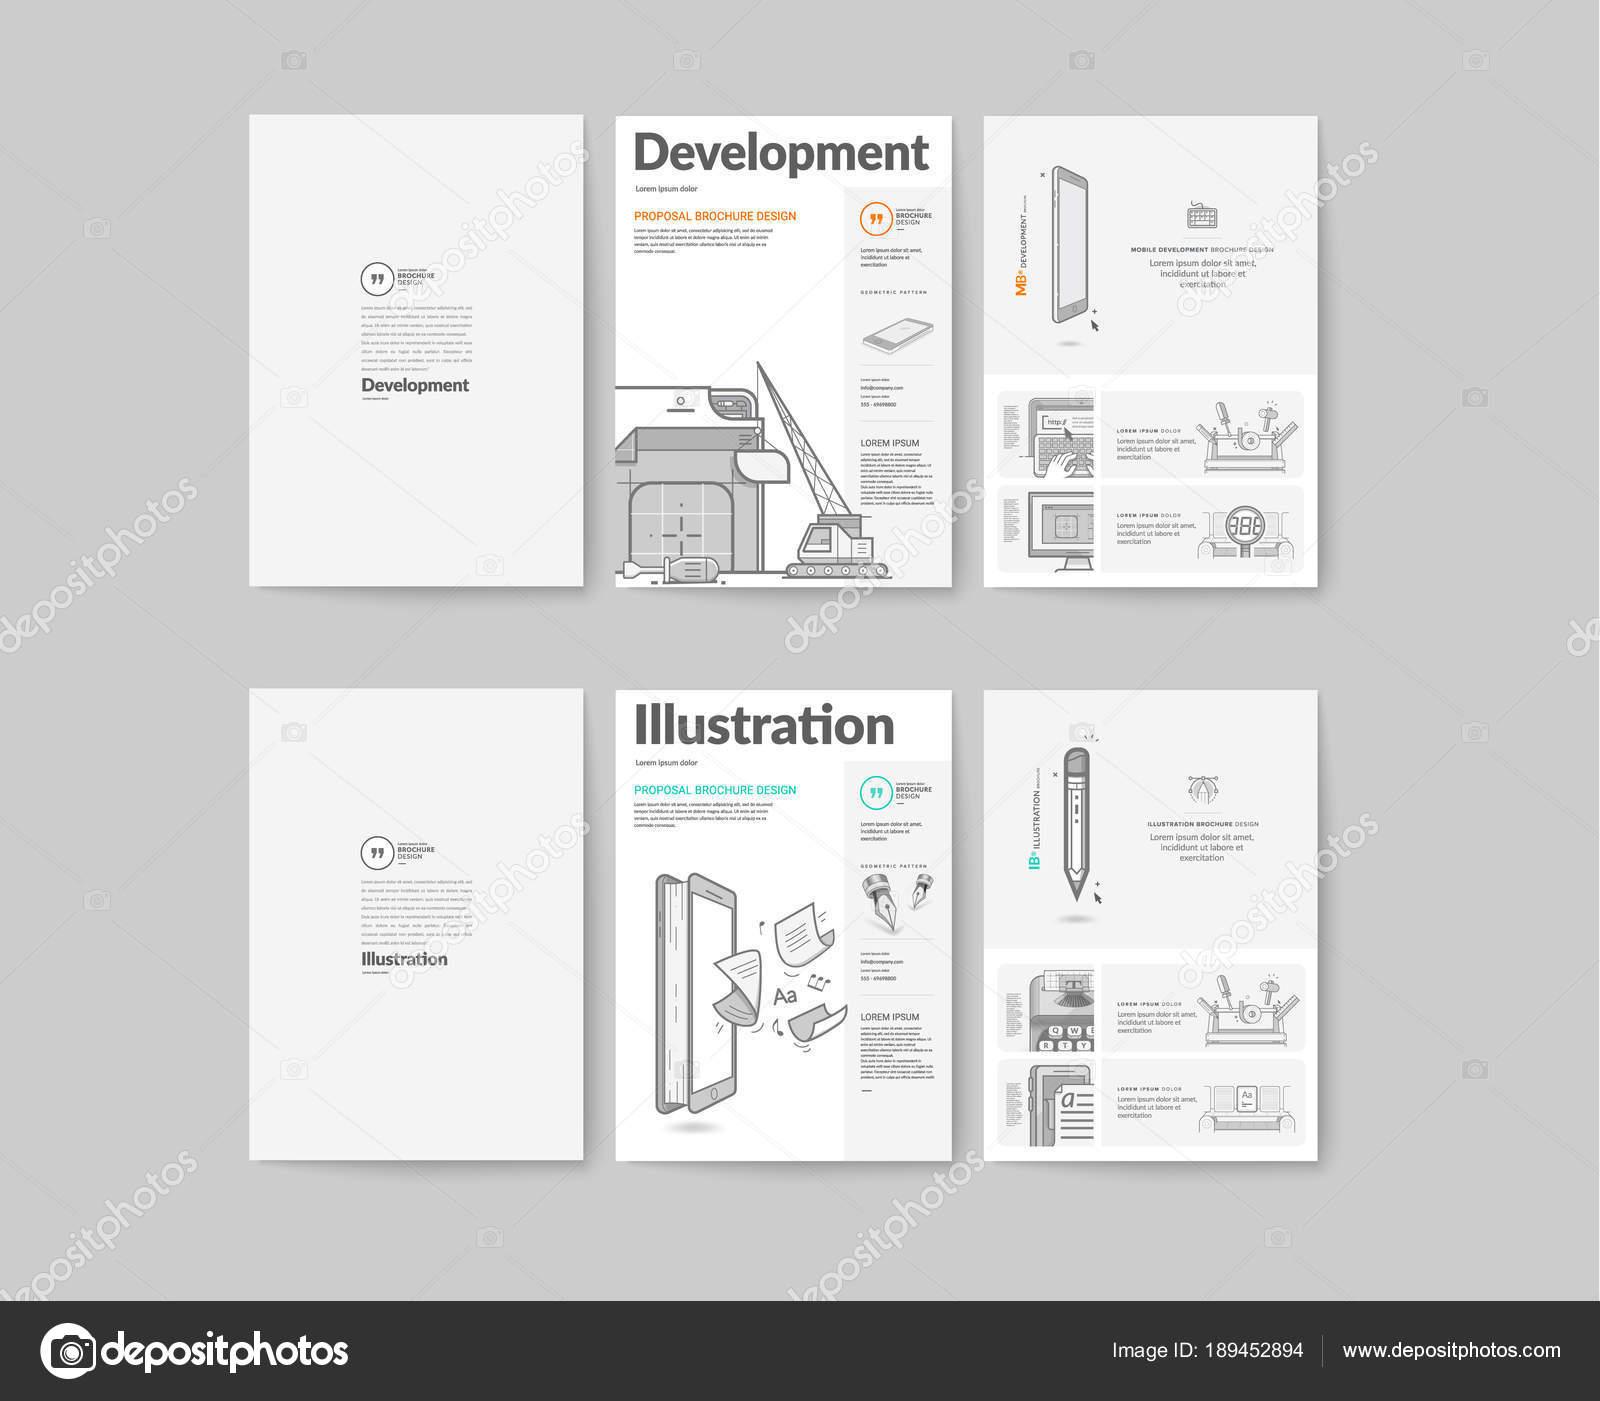 Bifold Brochure Collection Concept Icons Stock Vector Rh Depositphotos Com Brochure  Examples Brochure Examples